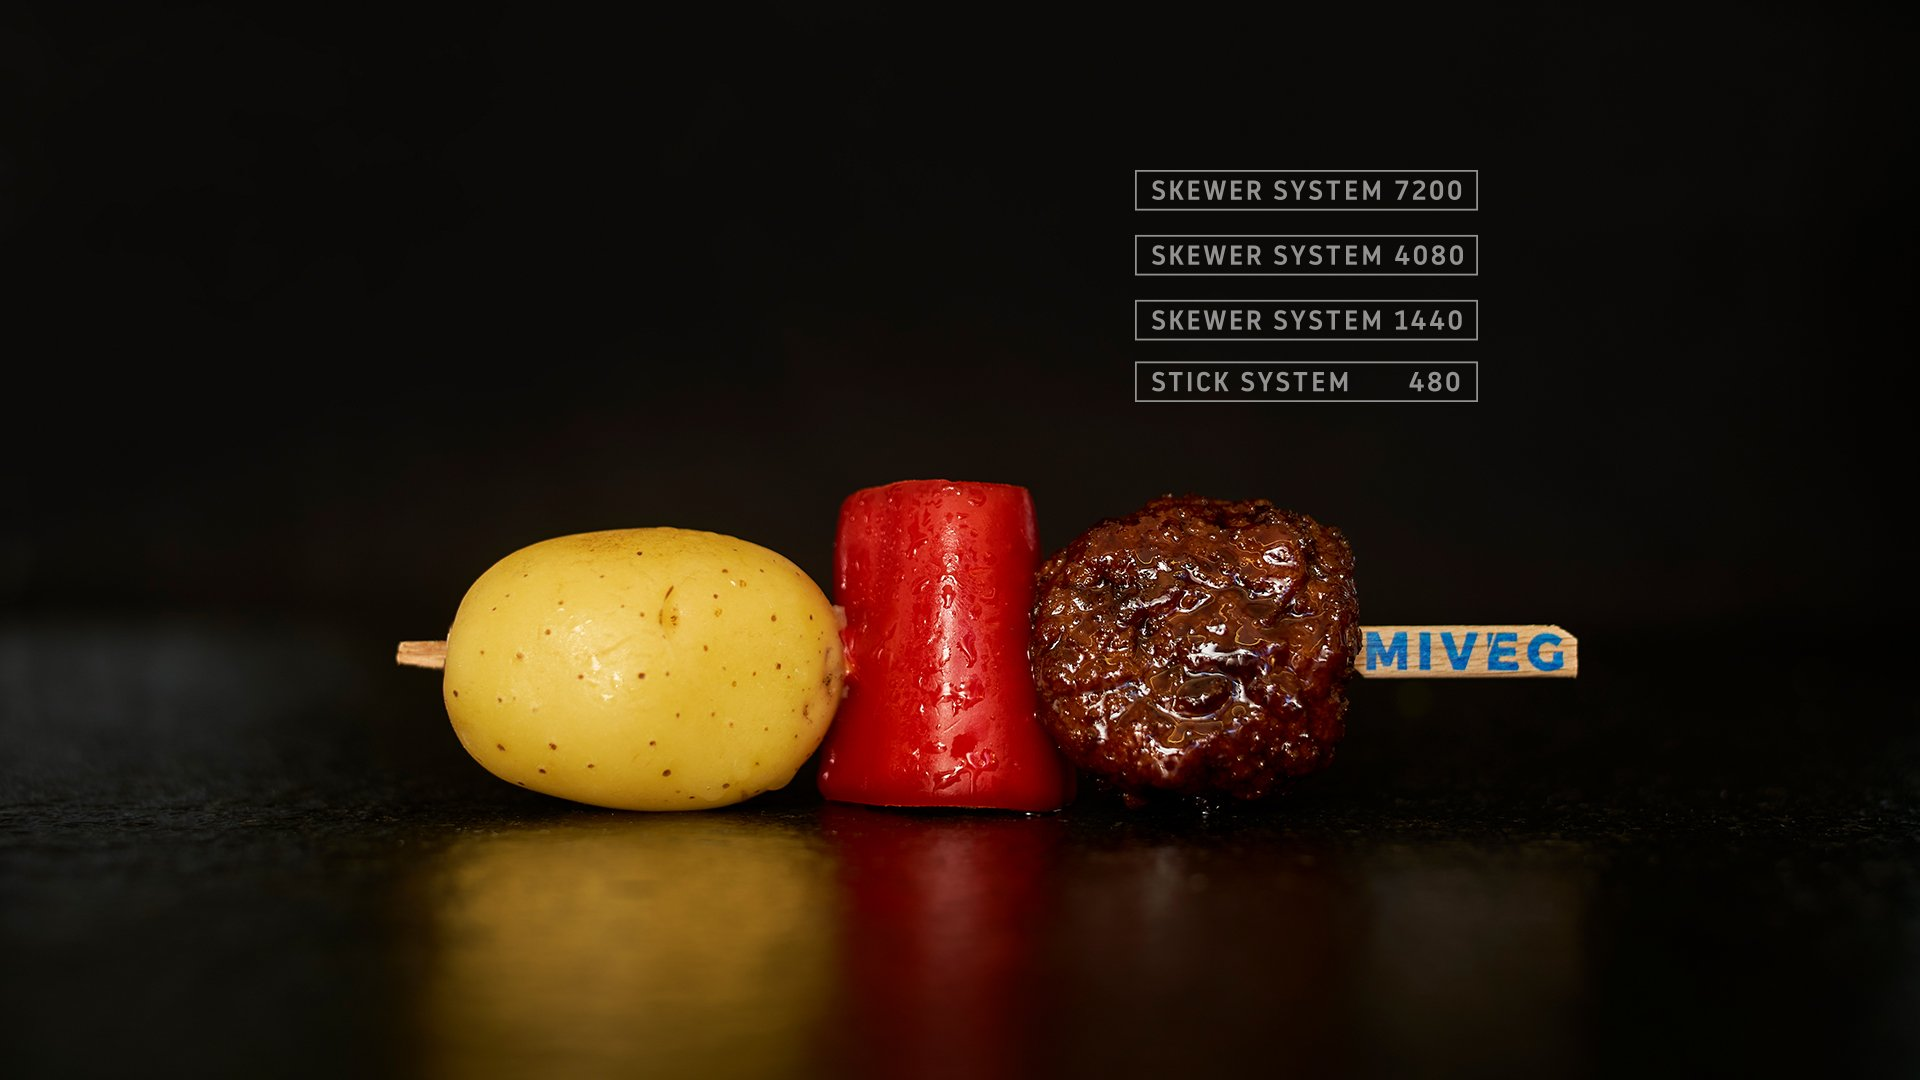 Miveg Skewer Systems · Kartoffel Paprika Hackfleisch Spieß · Potato paprika minced meat skewer